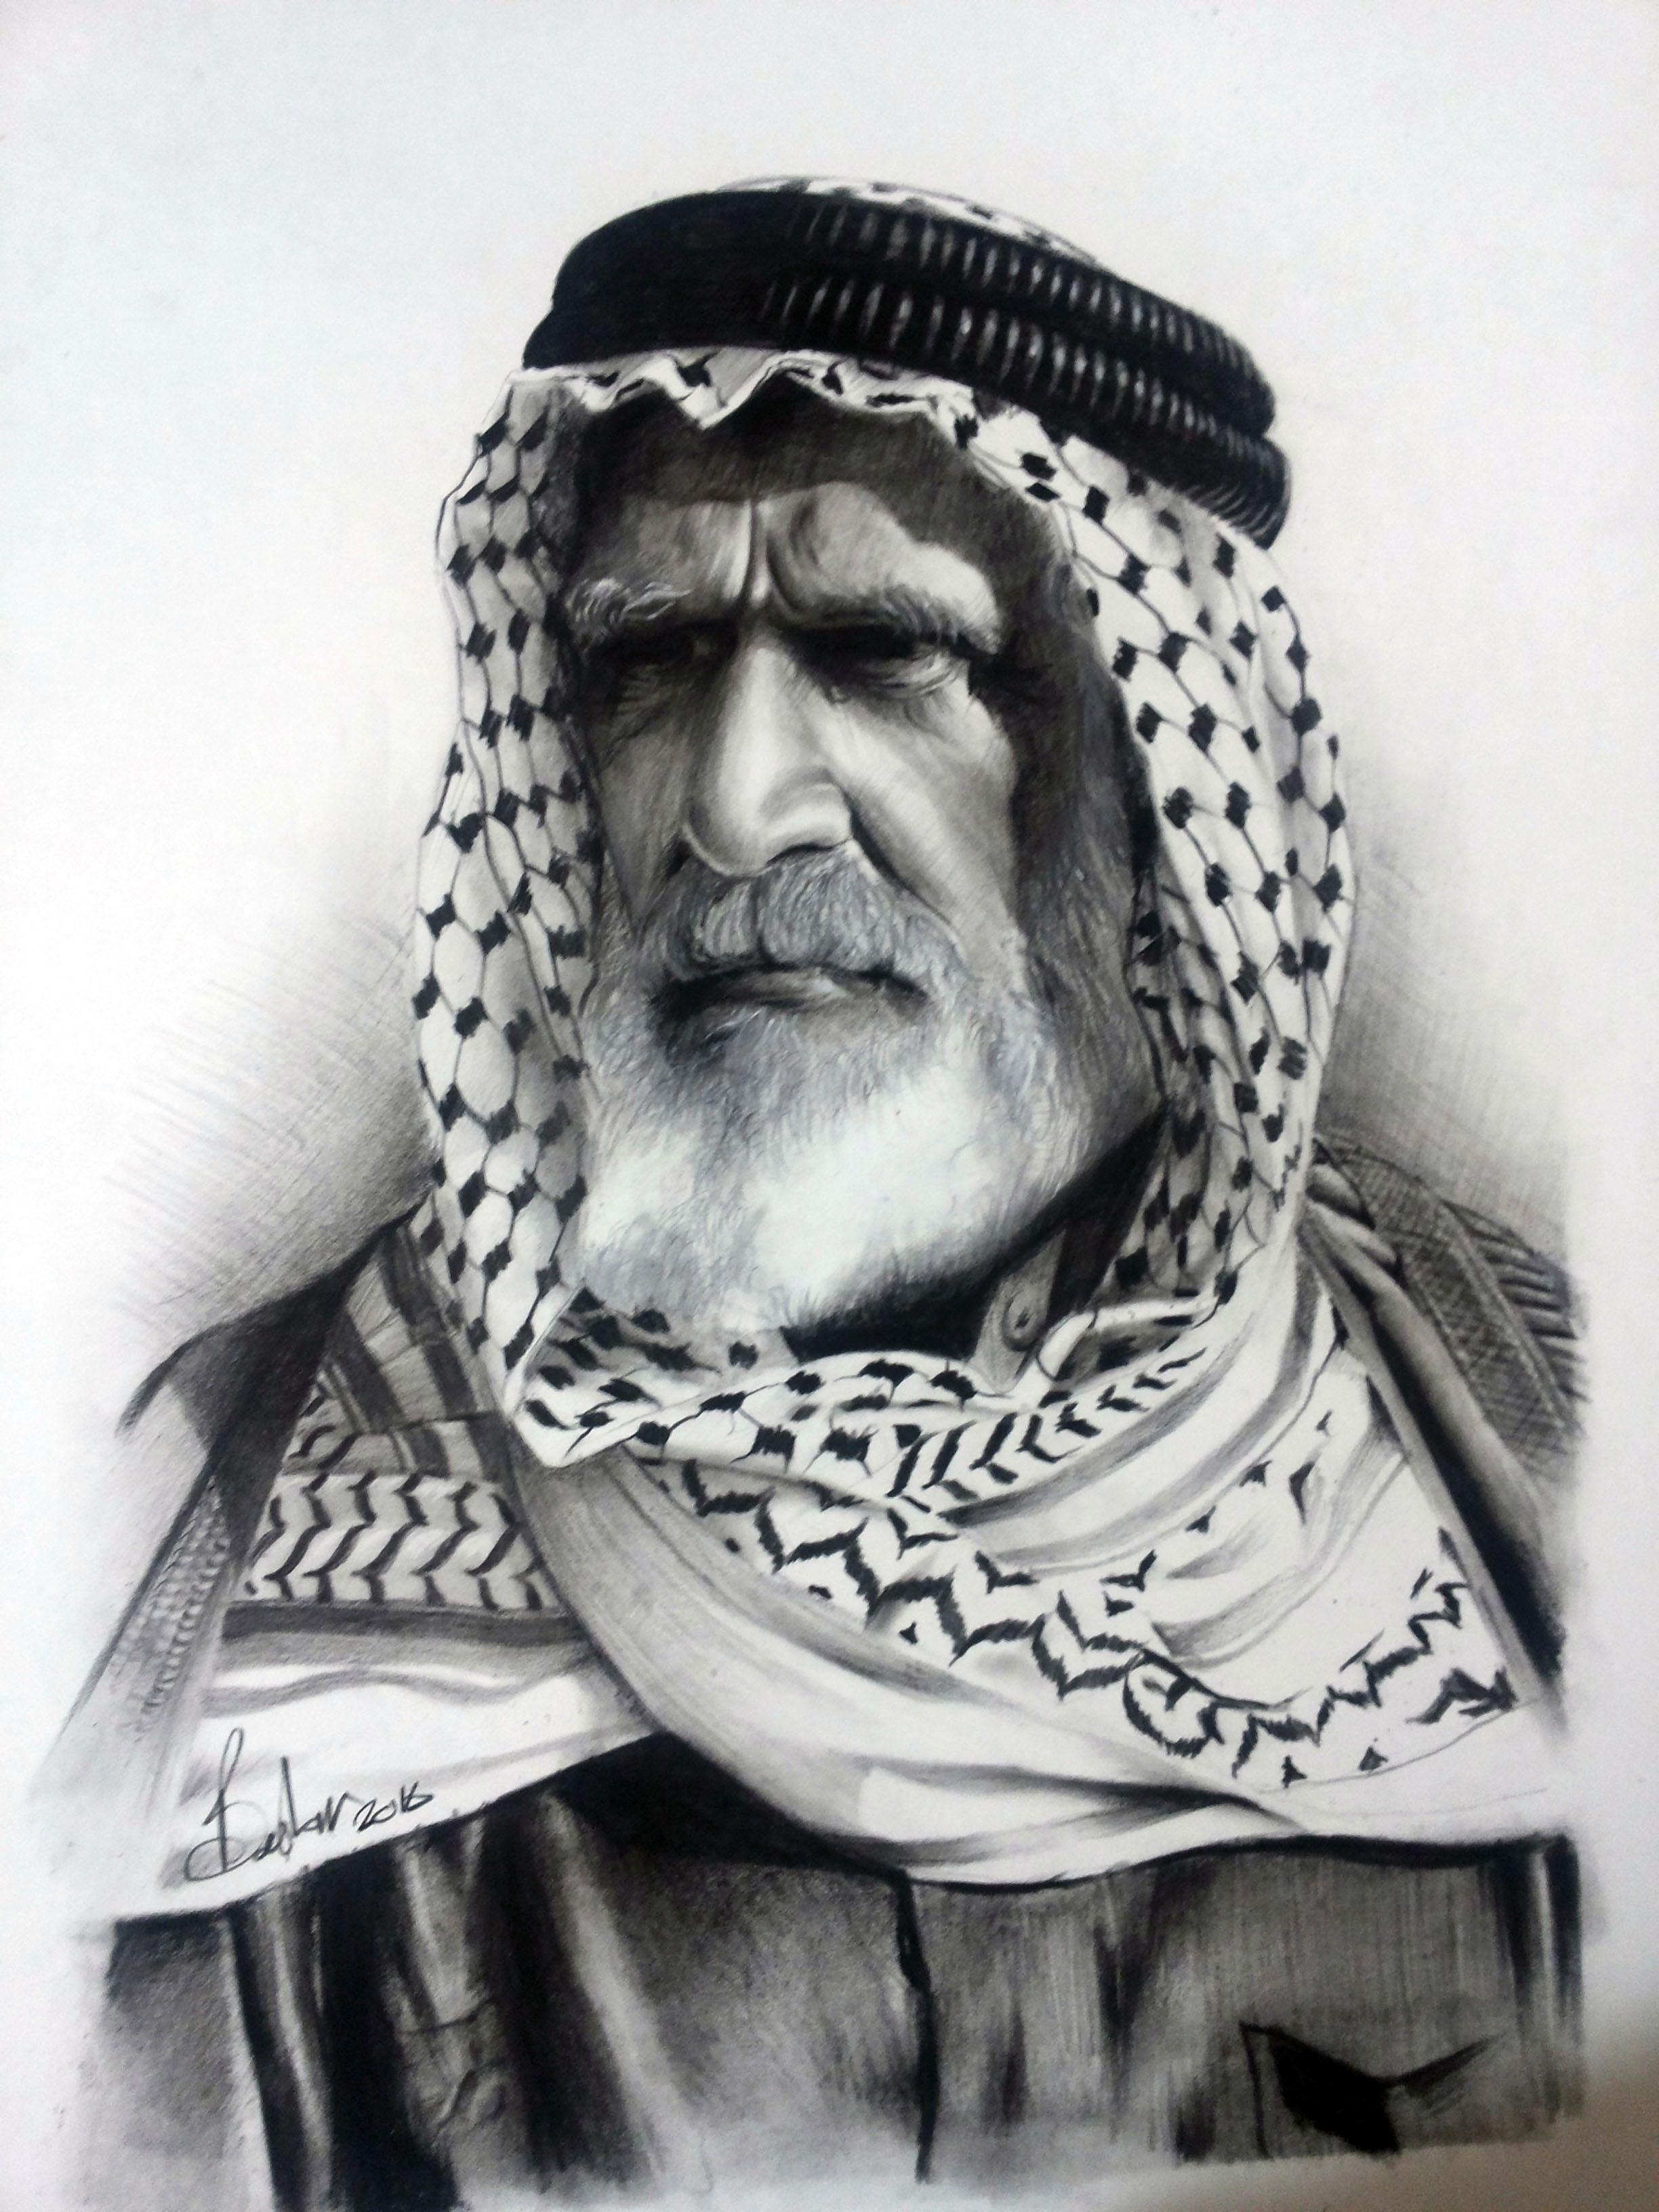 charcoal - Bashar majeed